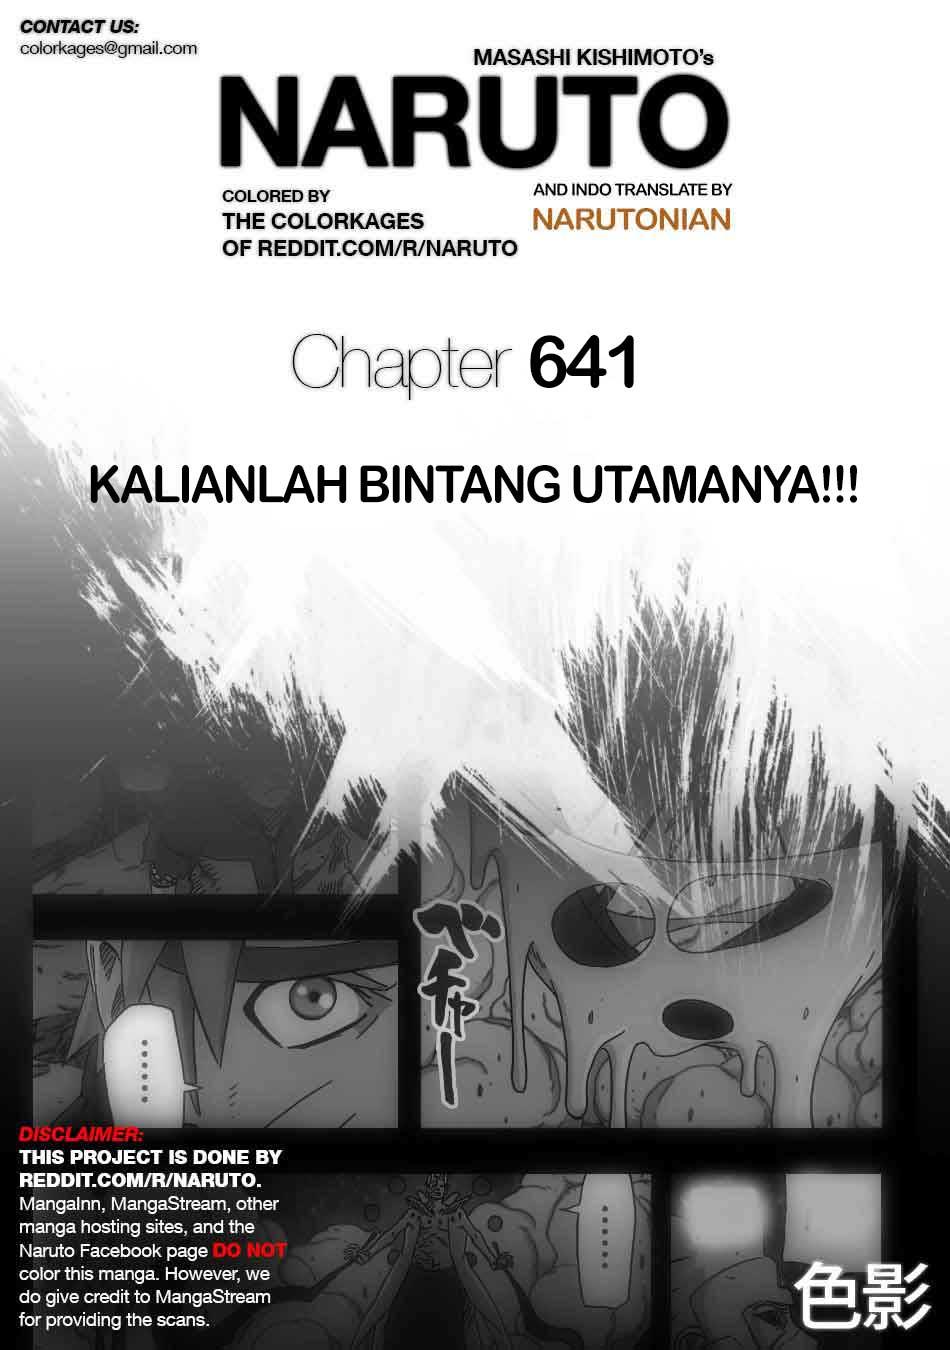 Dilarang COPAS - situs resmi www.mangacanblog.com - Komik naruto berwarna 641 - kalianlah bintang utamanya 642 Indonesia naruto berwarna 641 - kalianlah bintang utamanya Terbaru  Baca Manga Komik Indonesia Mangacan